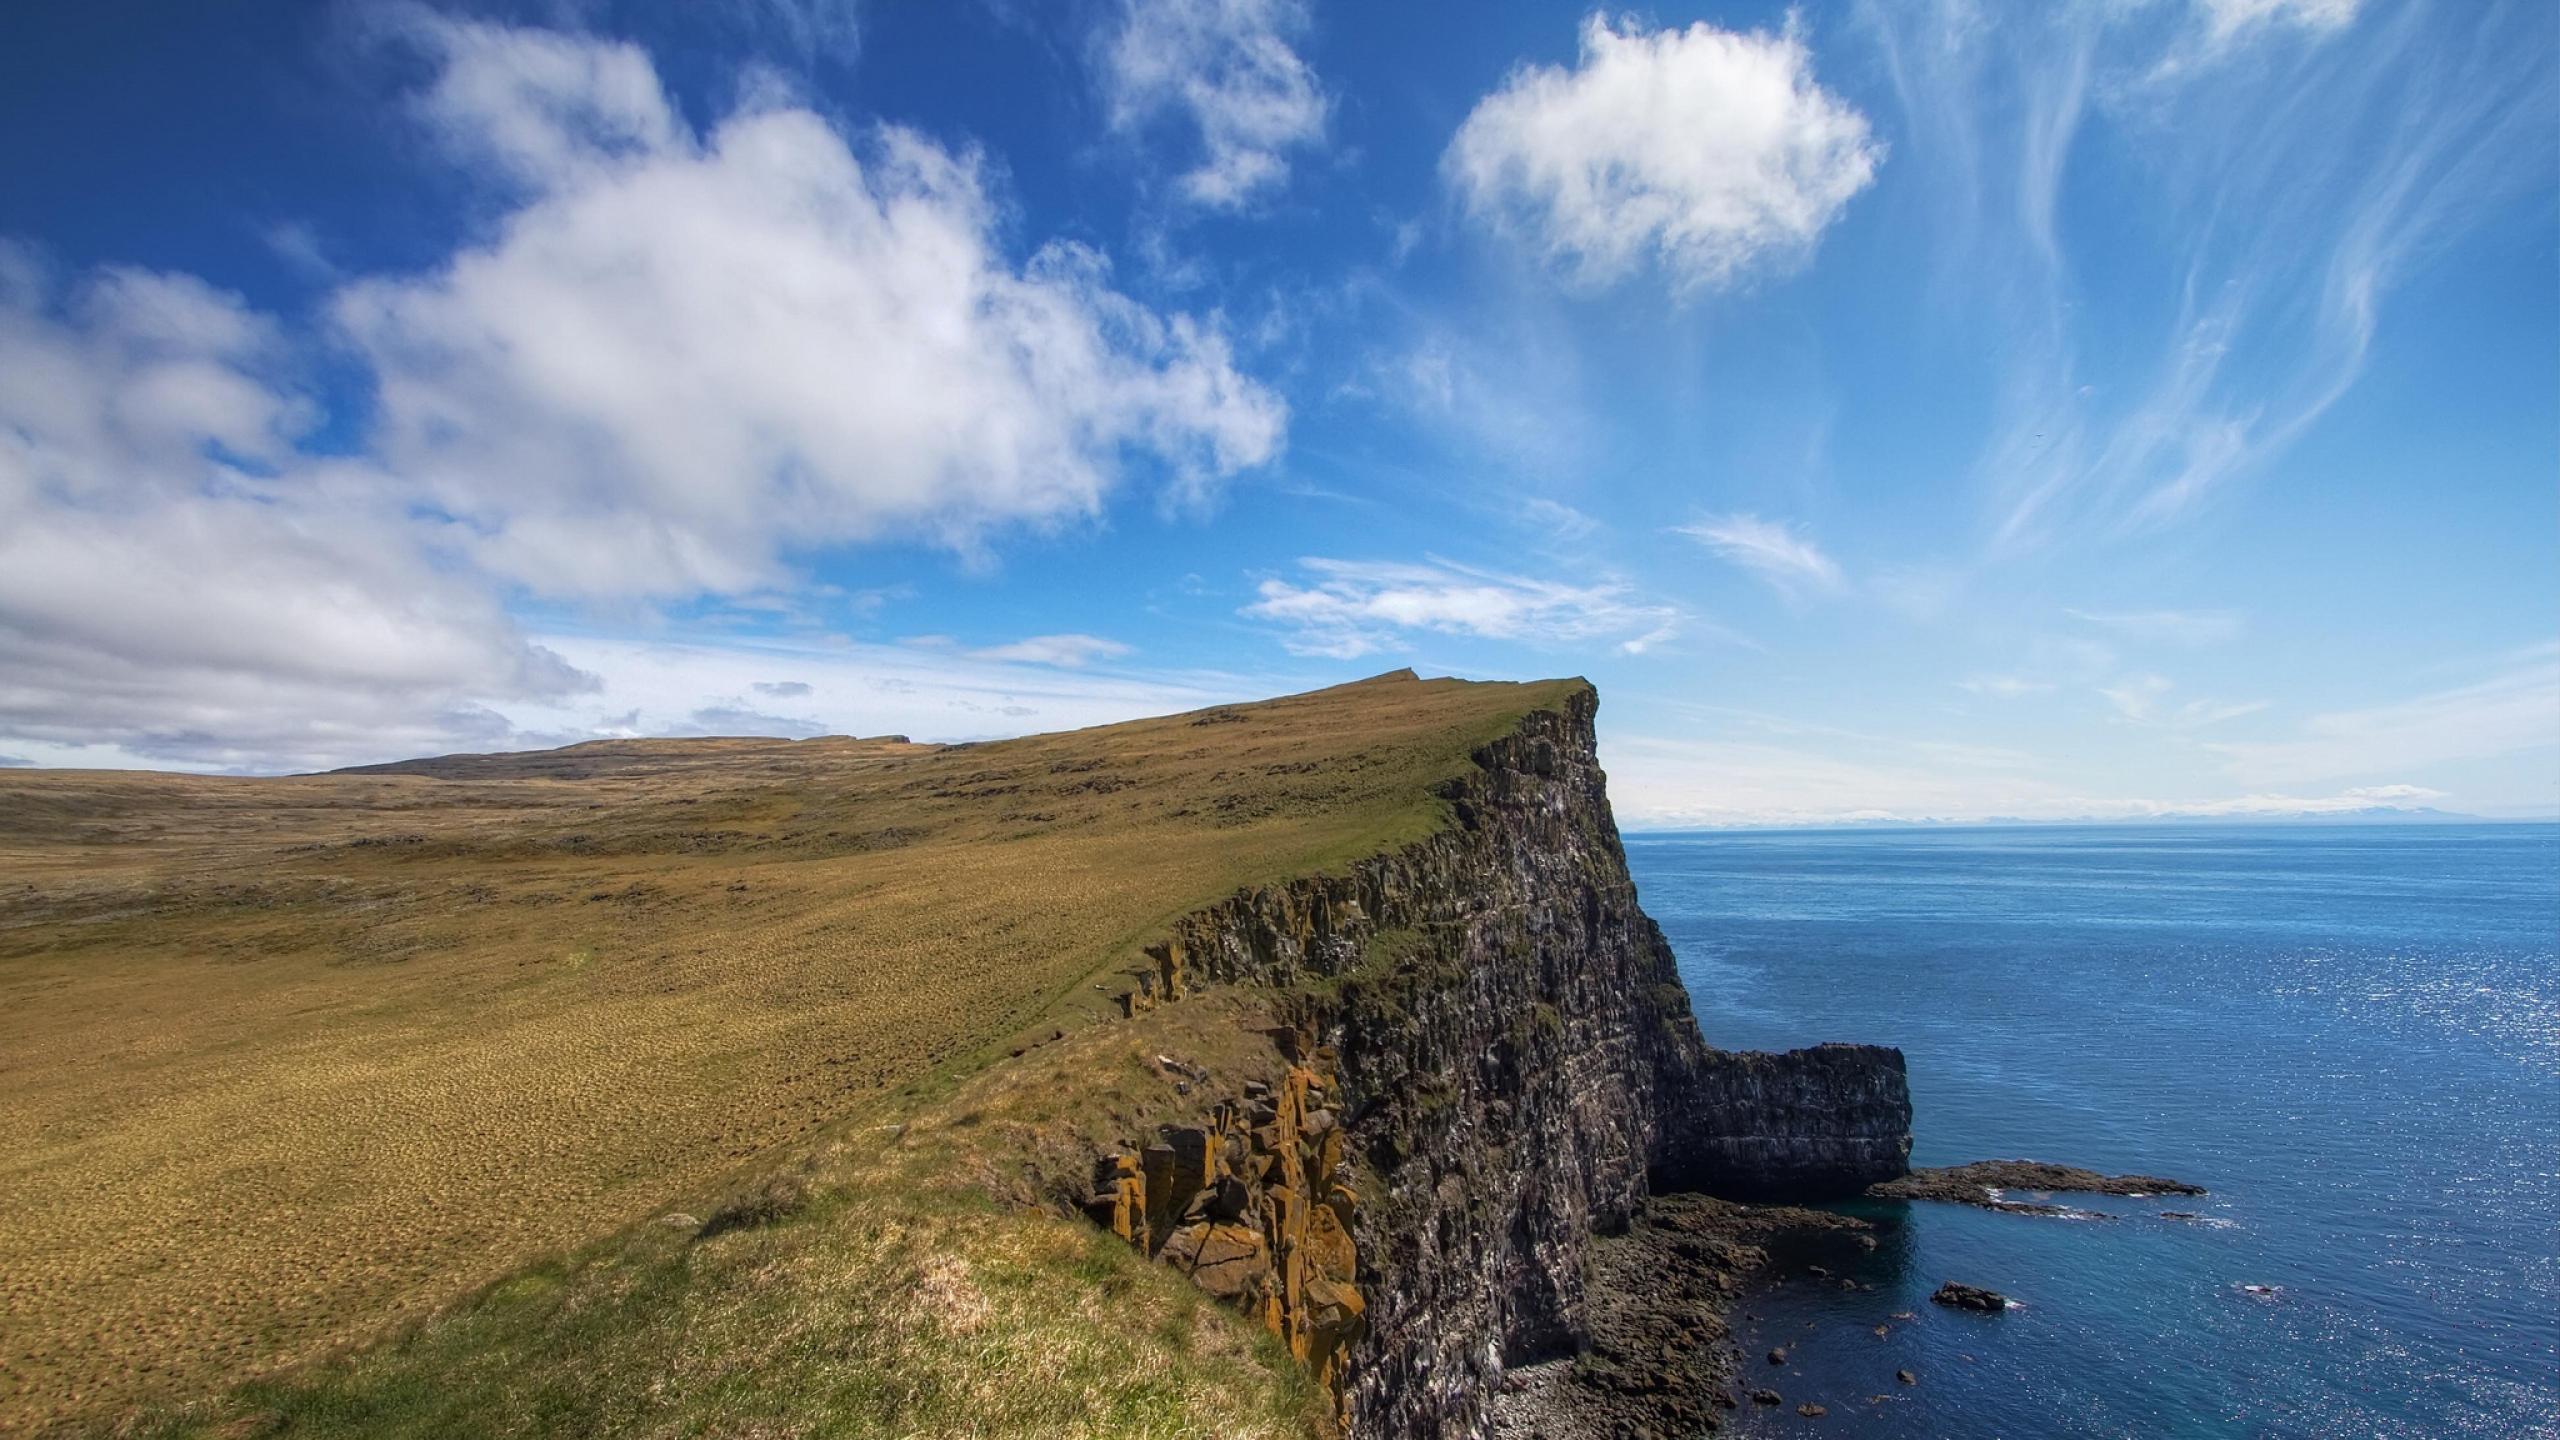 Cliff Sea Cliff Background 12177 2560x1440